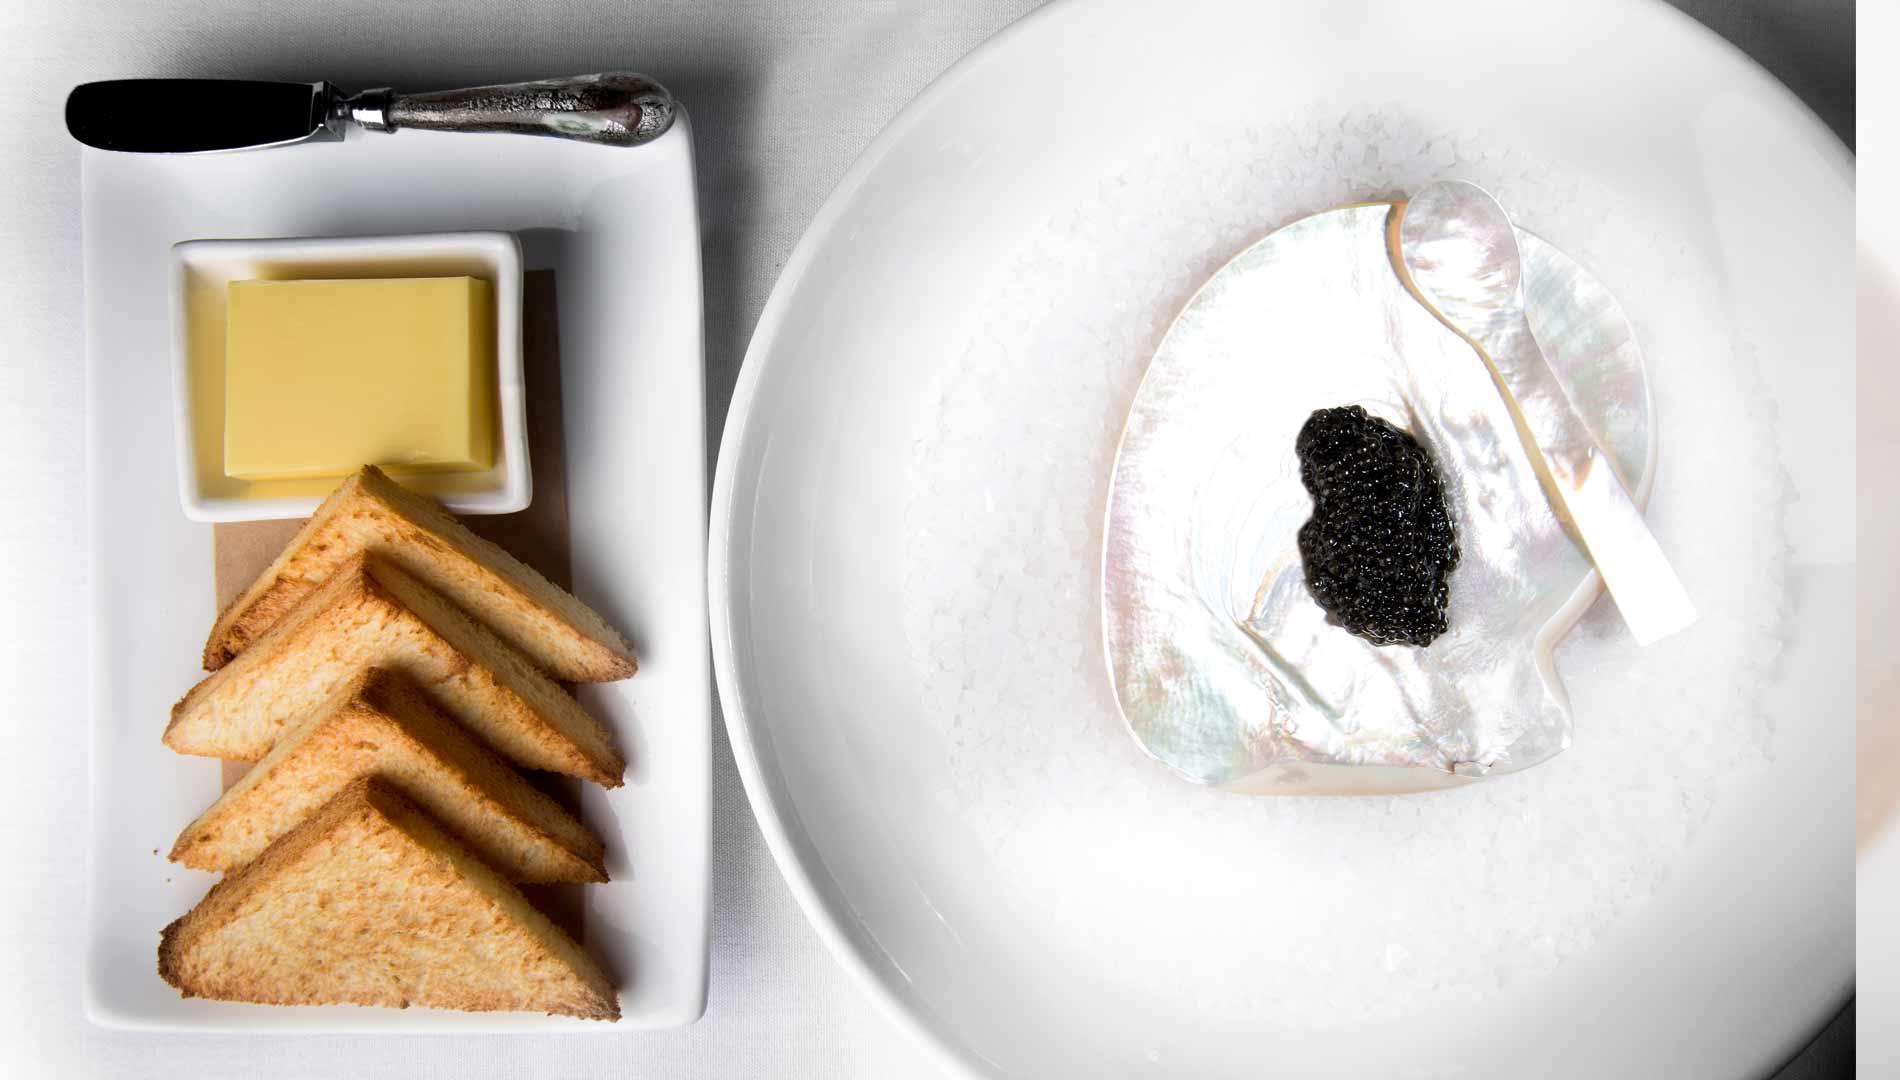 Noosa-Beachfront-Restaurant-Menu-01 - Sails Restaurant Noosa